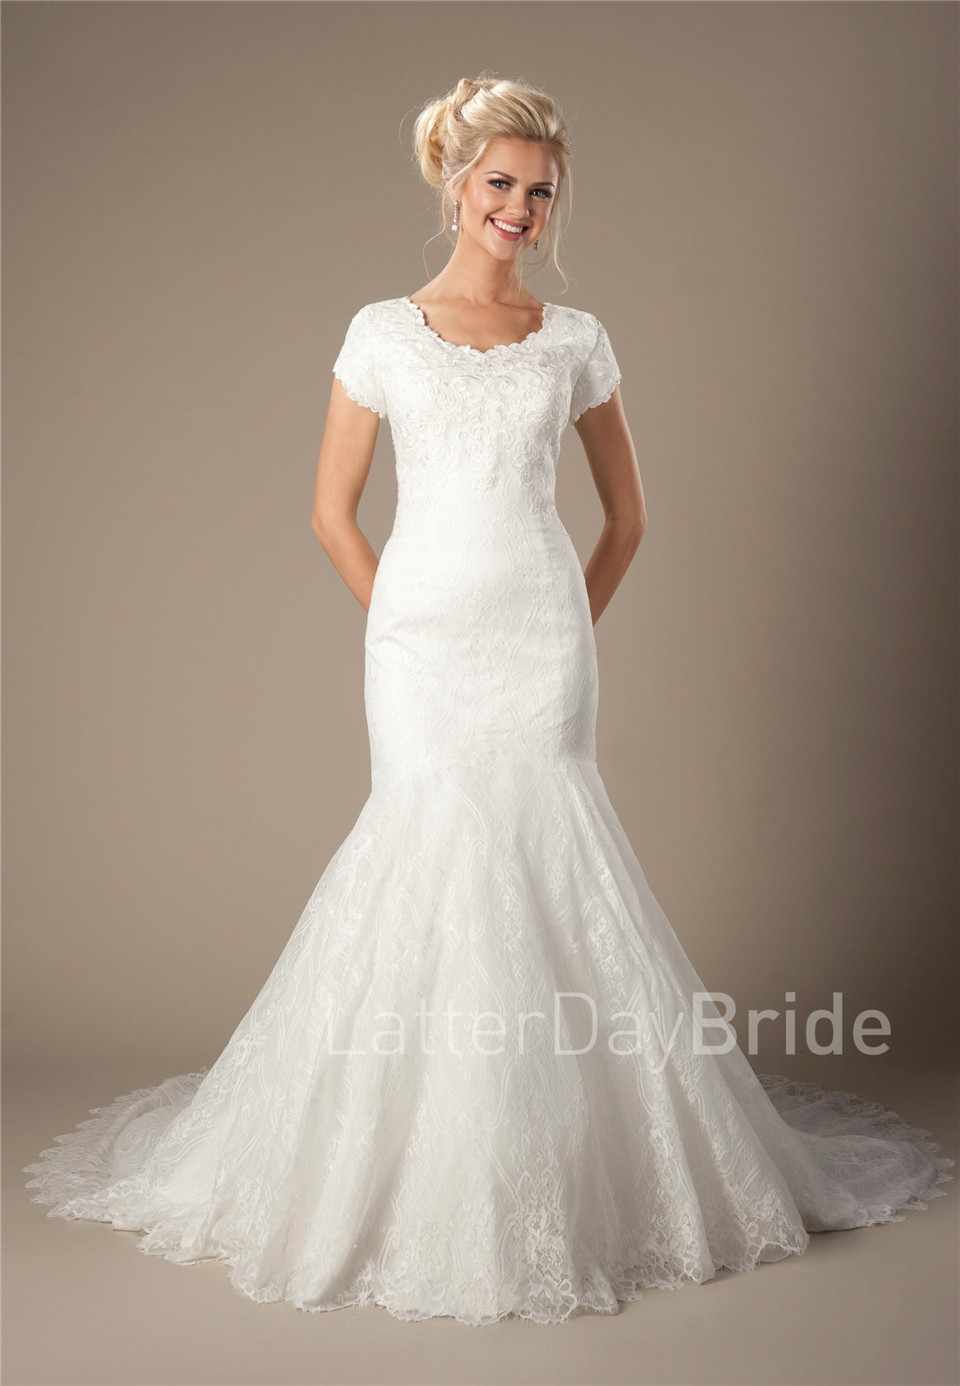 60s shift lace wedding dress 60's wedding dress KItty and Dulcie Baroness portrait